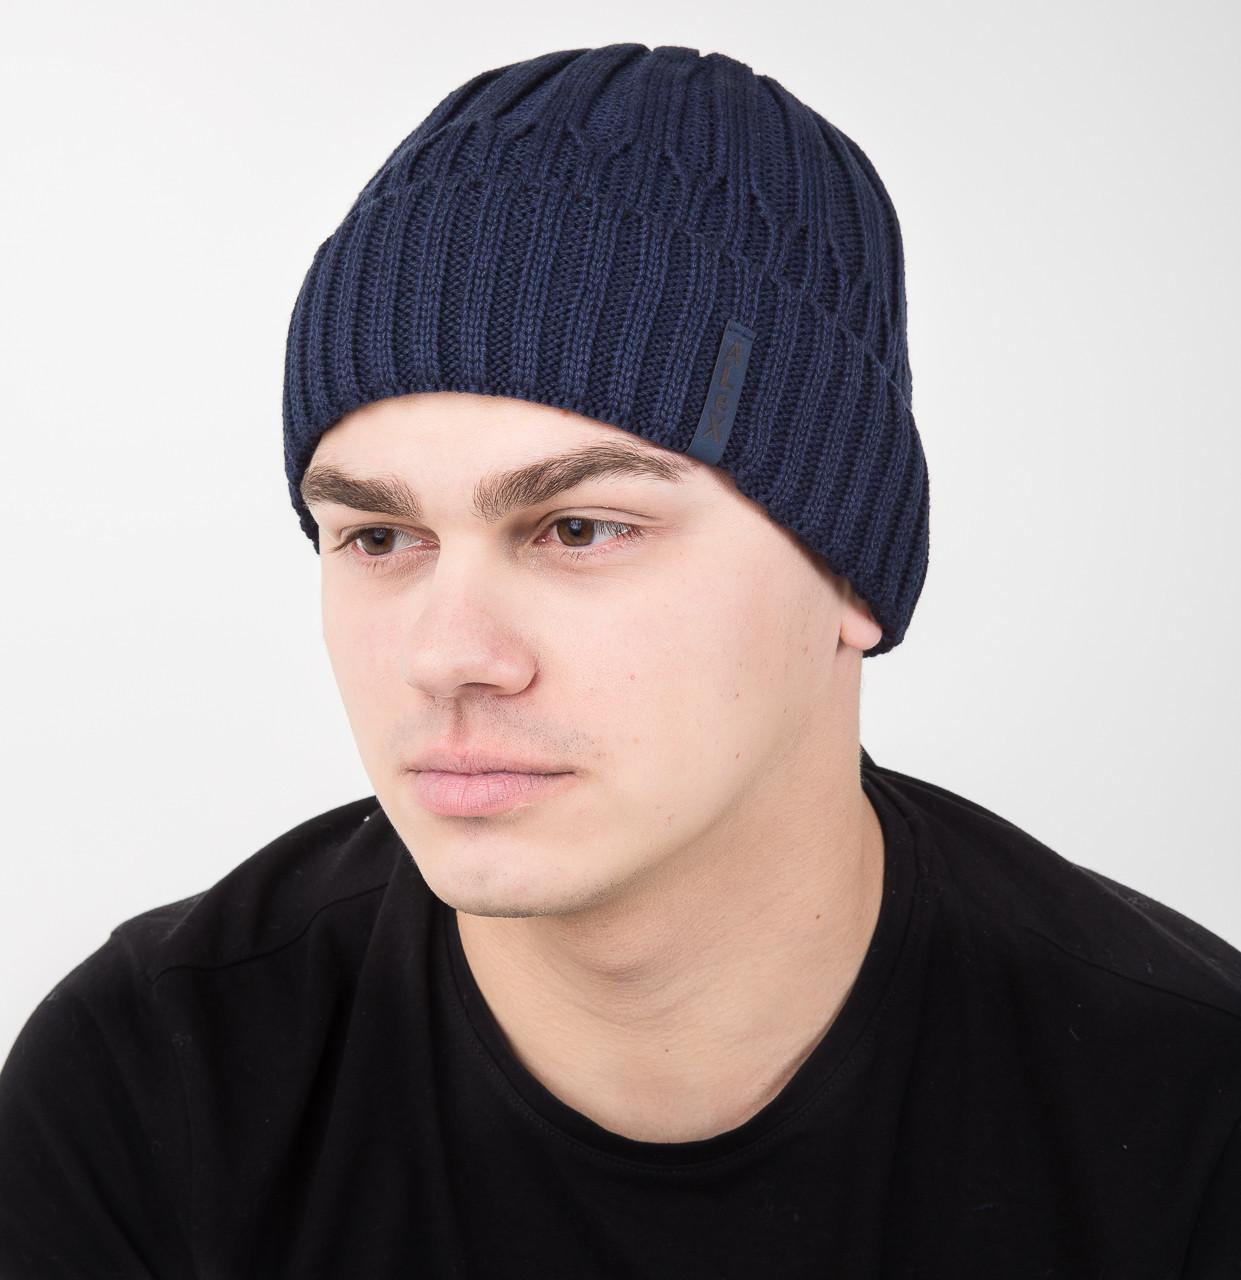 купить зимнюю вязаную шапку для мужчин арт Al17029 по лучшим ценам